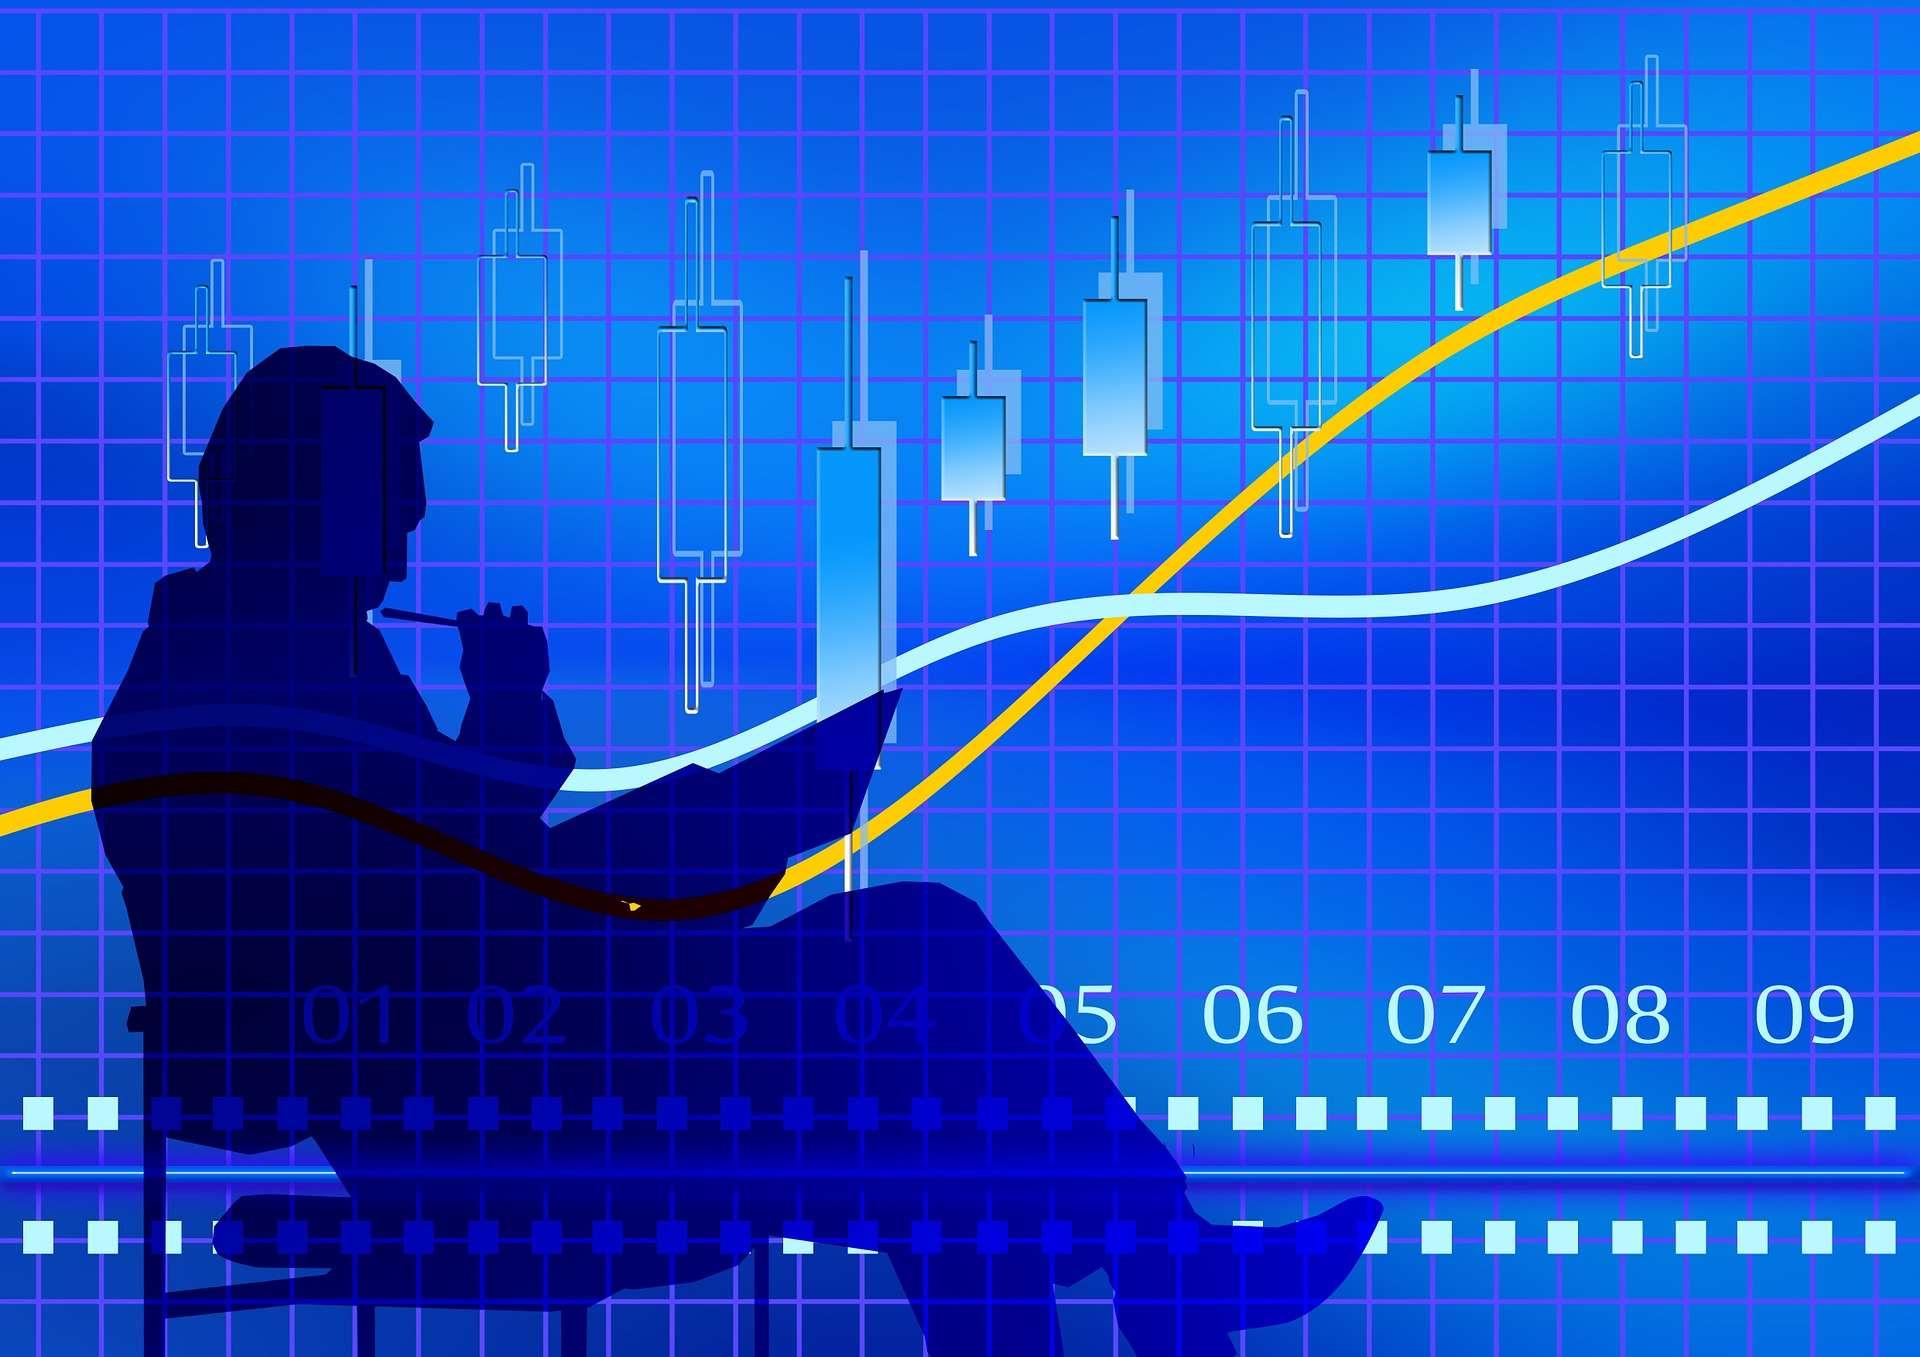 Алгоритмы торговли на бирже Форекс